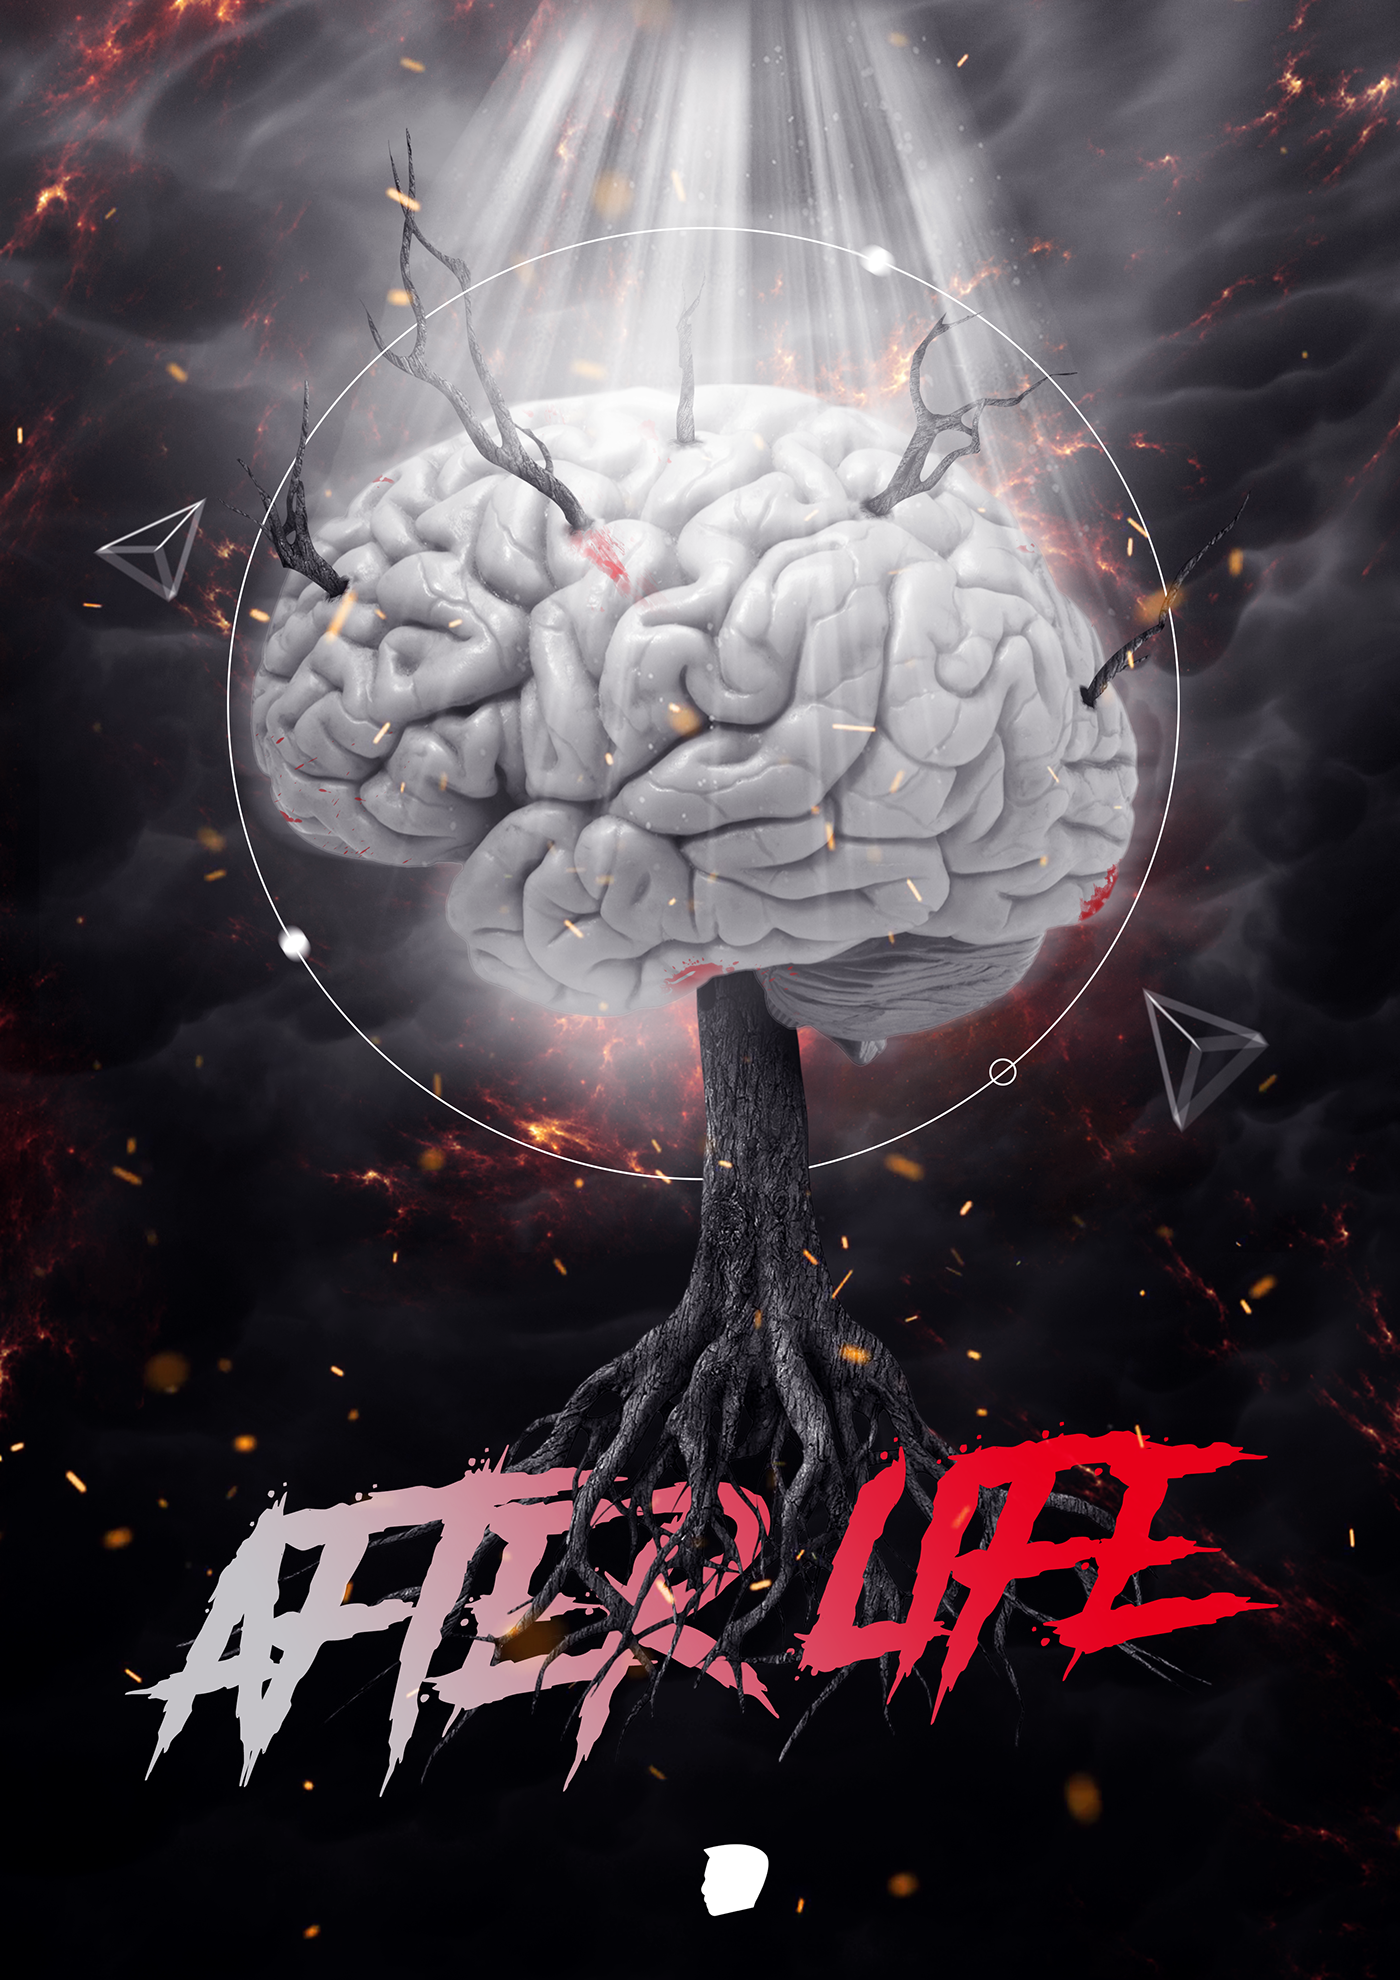 Photo Manipulation  artwork graphic design  poster concept art movie poster